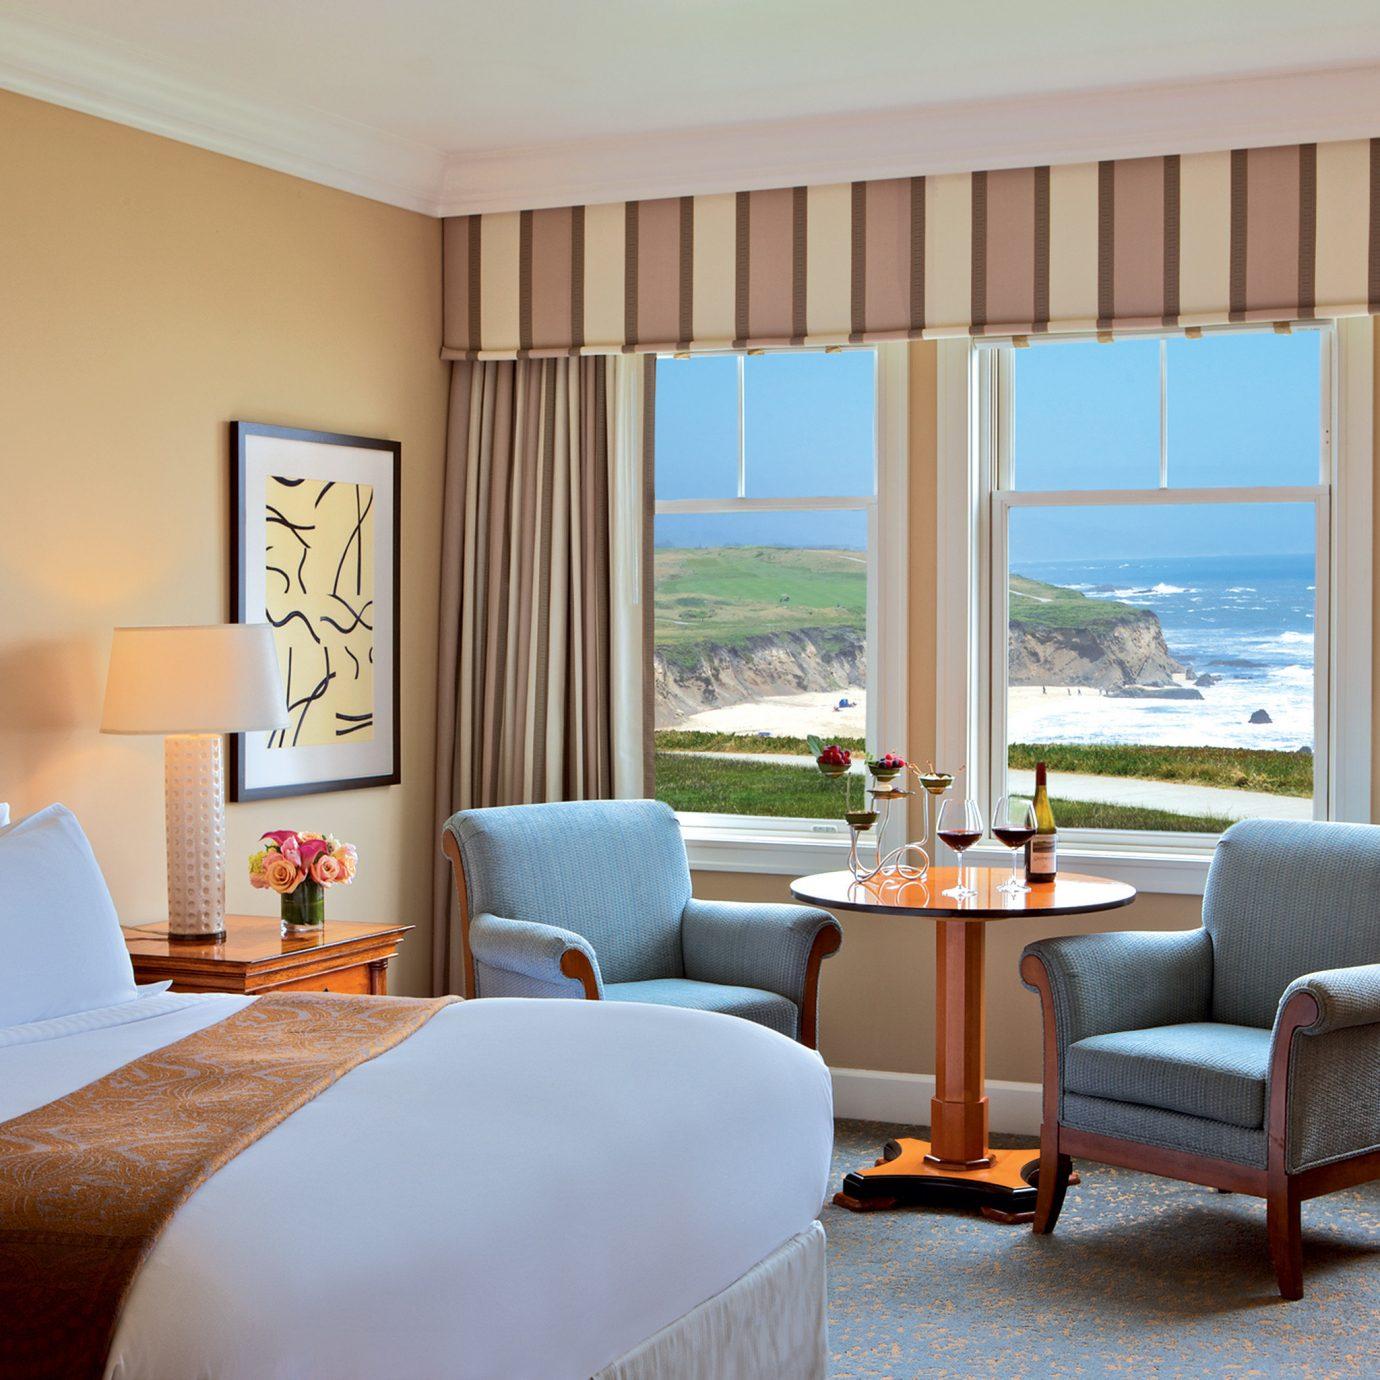 Bedroom Hotels Lounge Luxury Modern Scenic views Suite chair property Resort home living room nice cottage condominium Villa